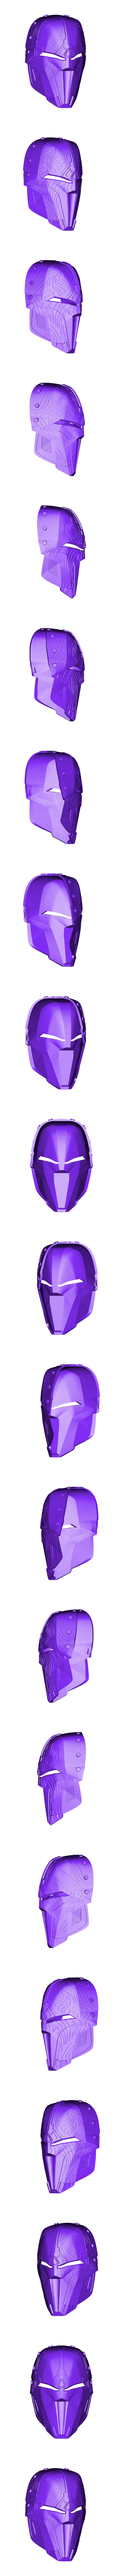 Sith_acolyte_mask_v12.STL Download STL file Sith Acolyte Mask • Design to 3D print, Elvalian